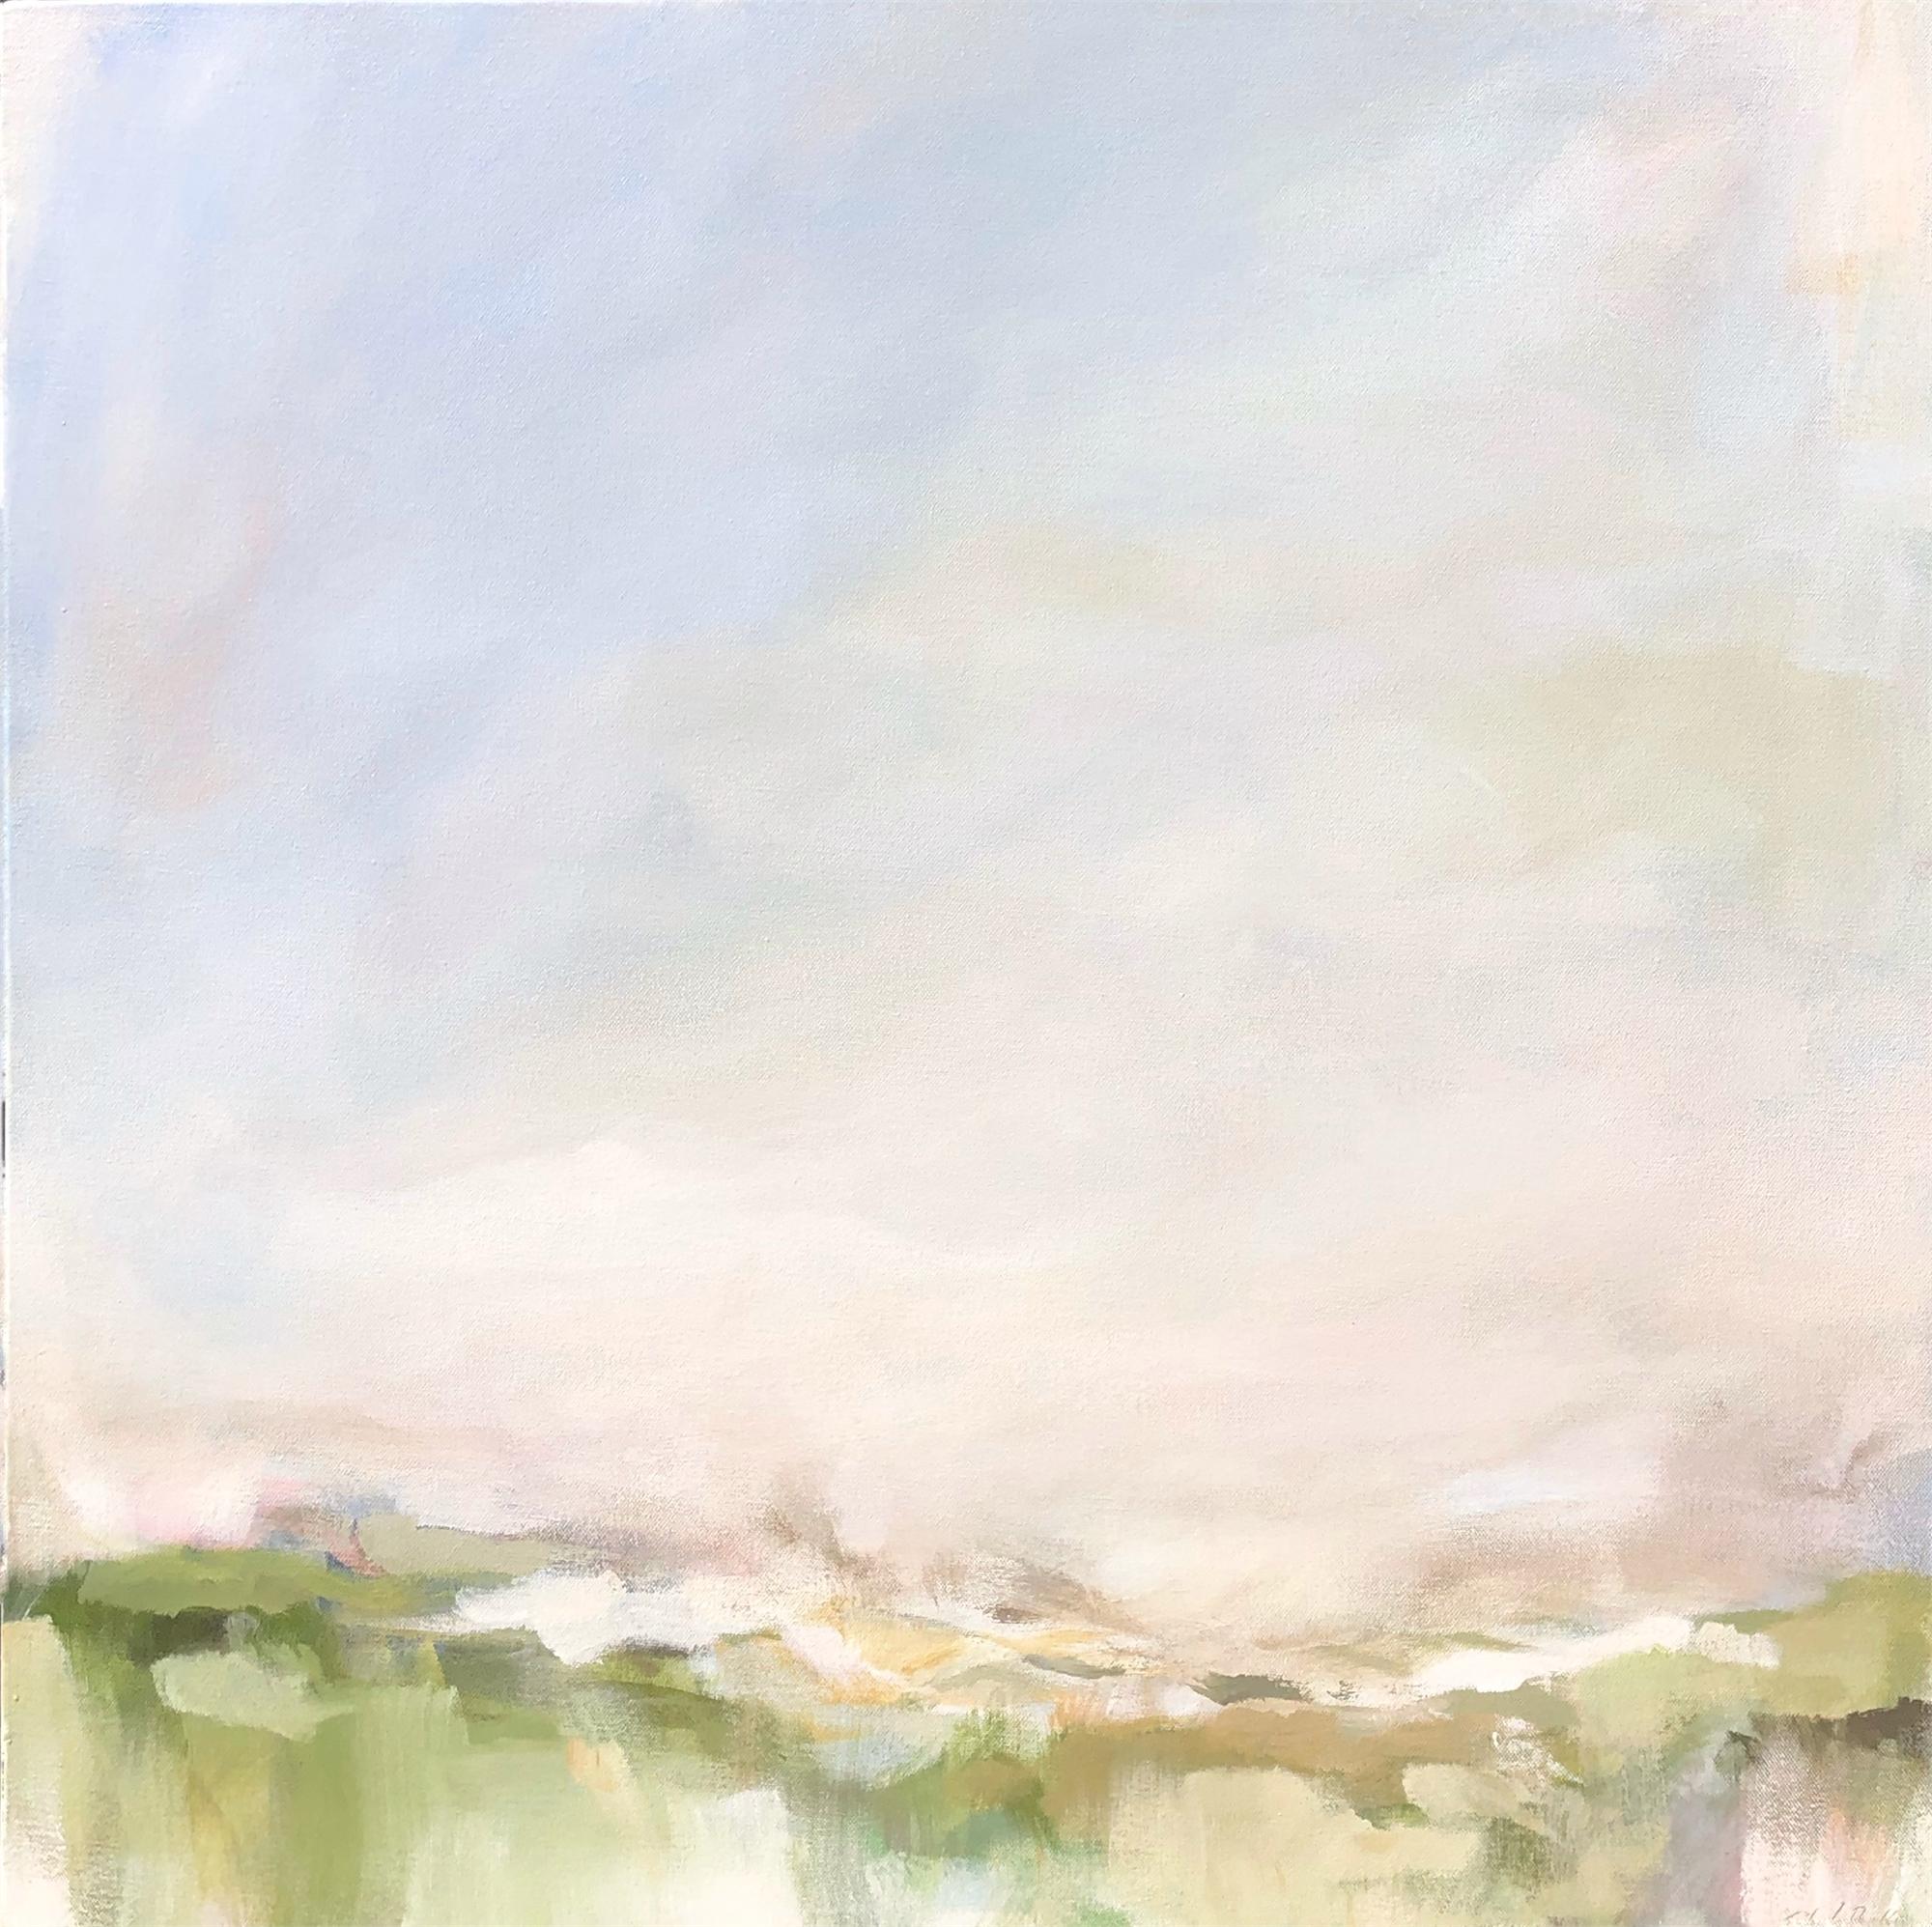 Quiet Dreams 2 by Christina Baker